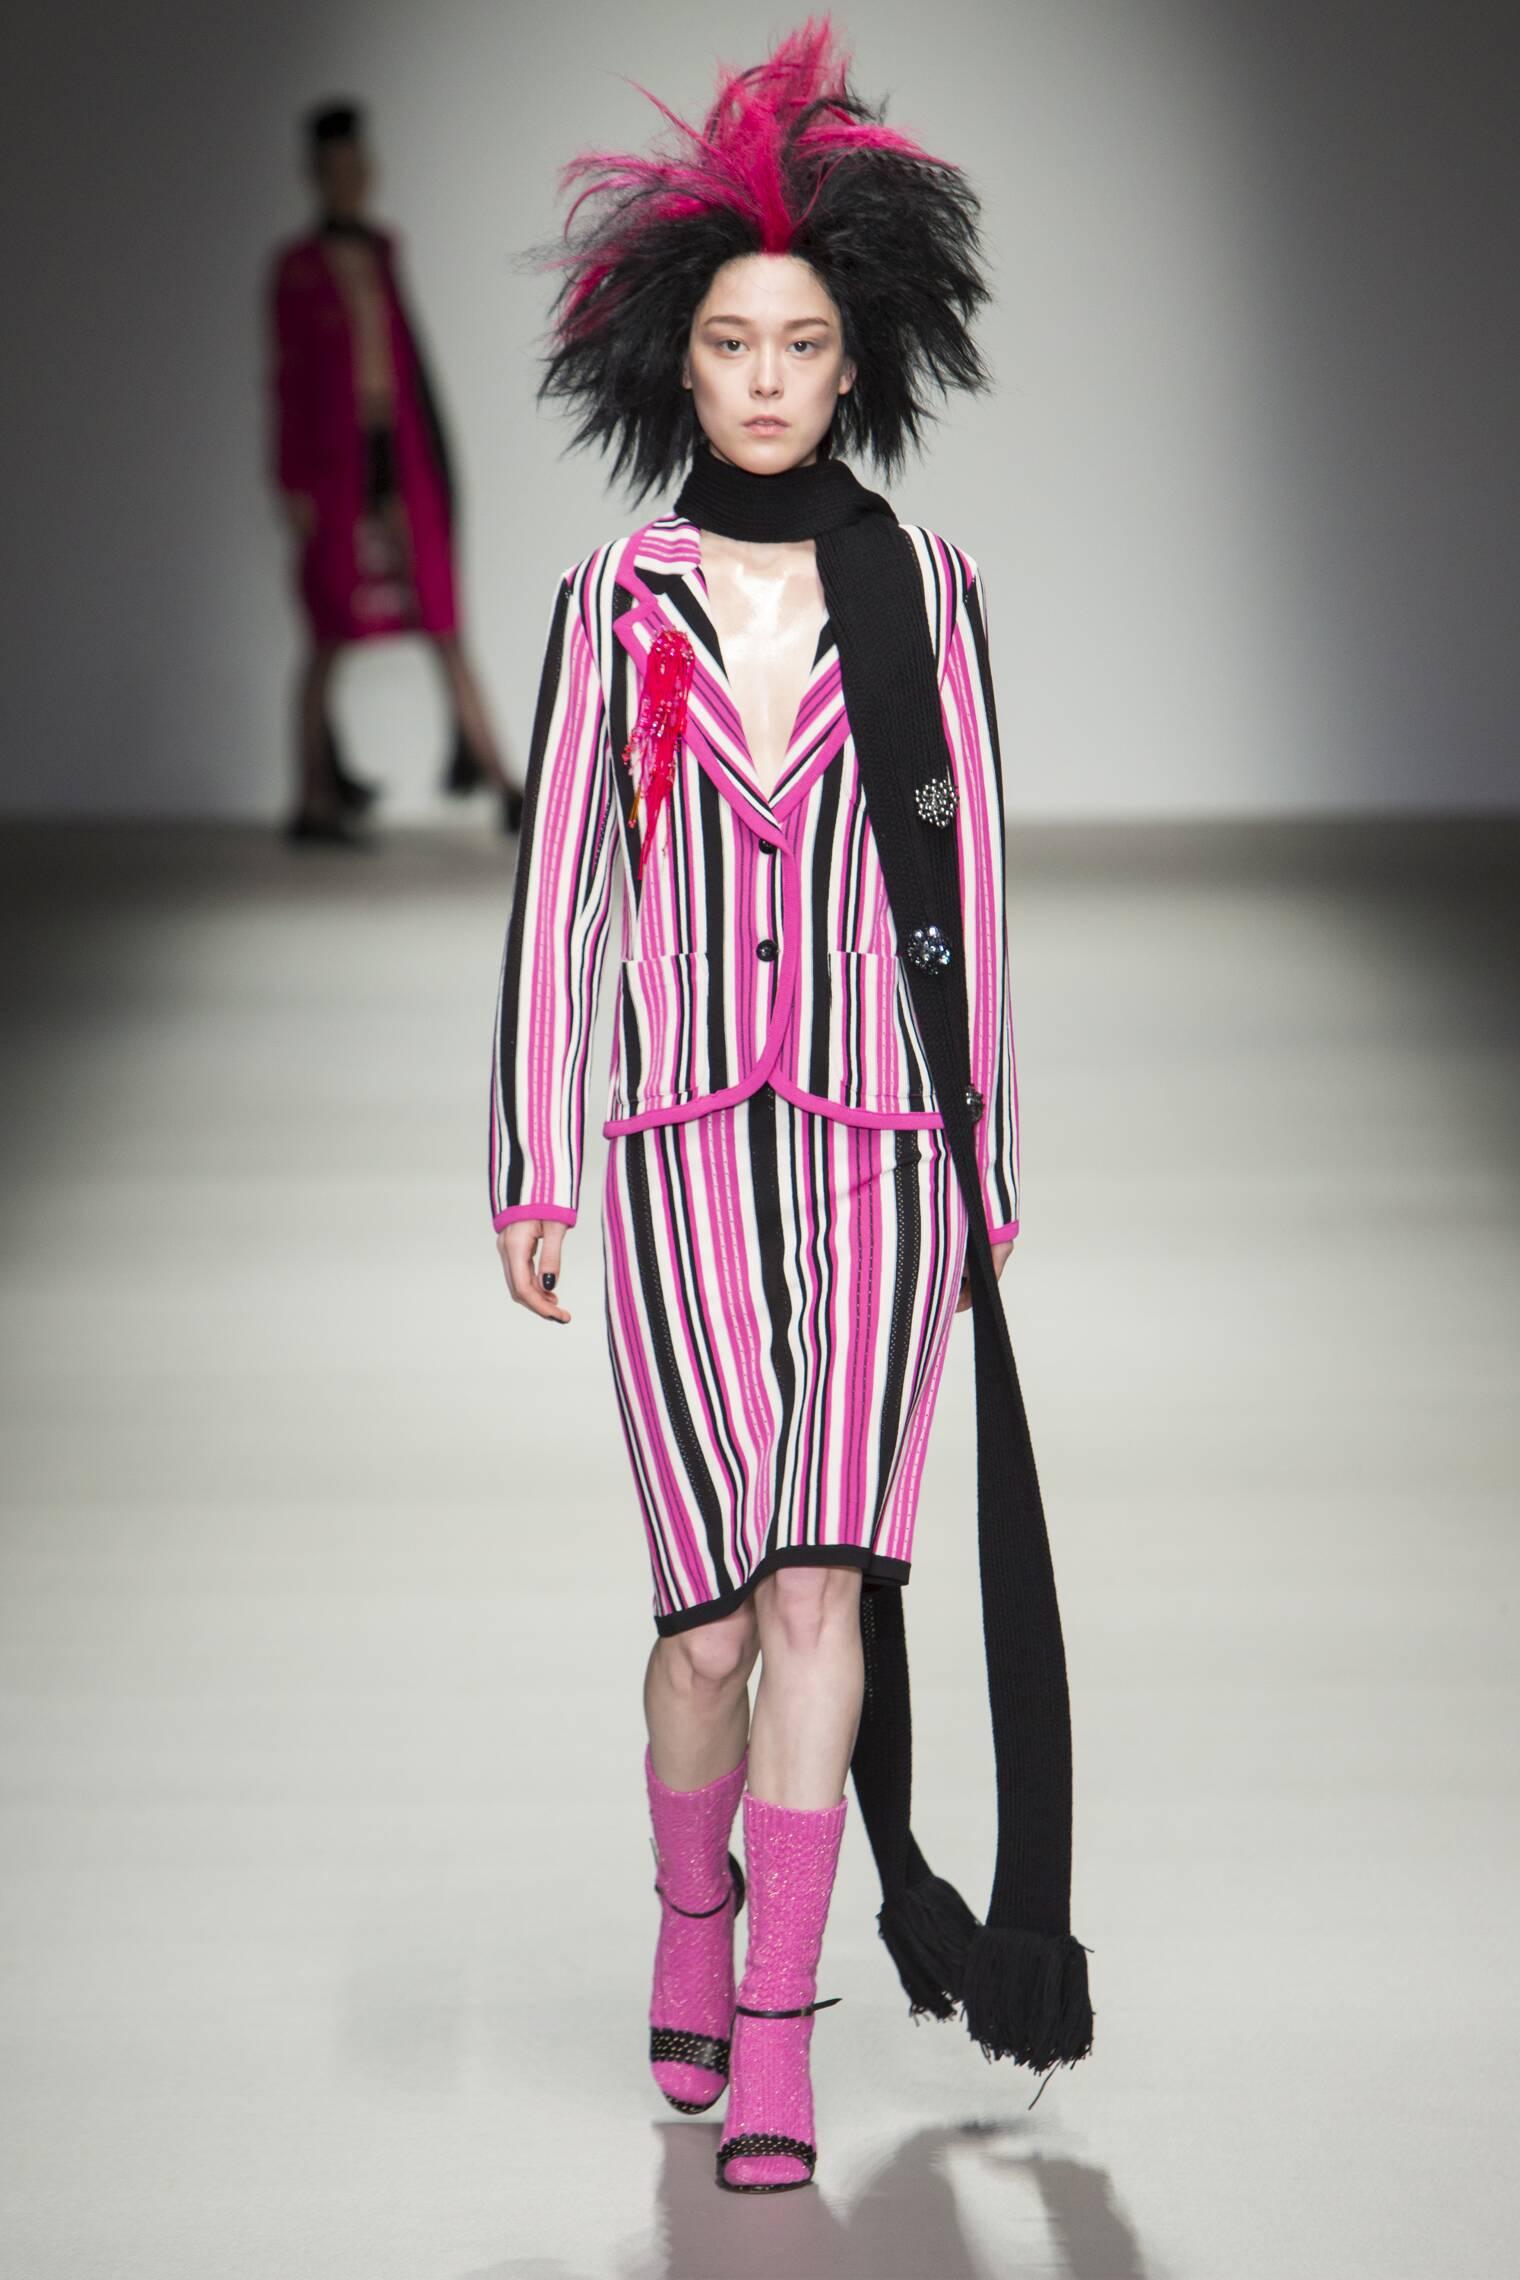 Fashion Shows in London Fashion Show 2015 London